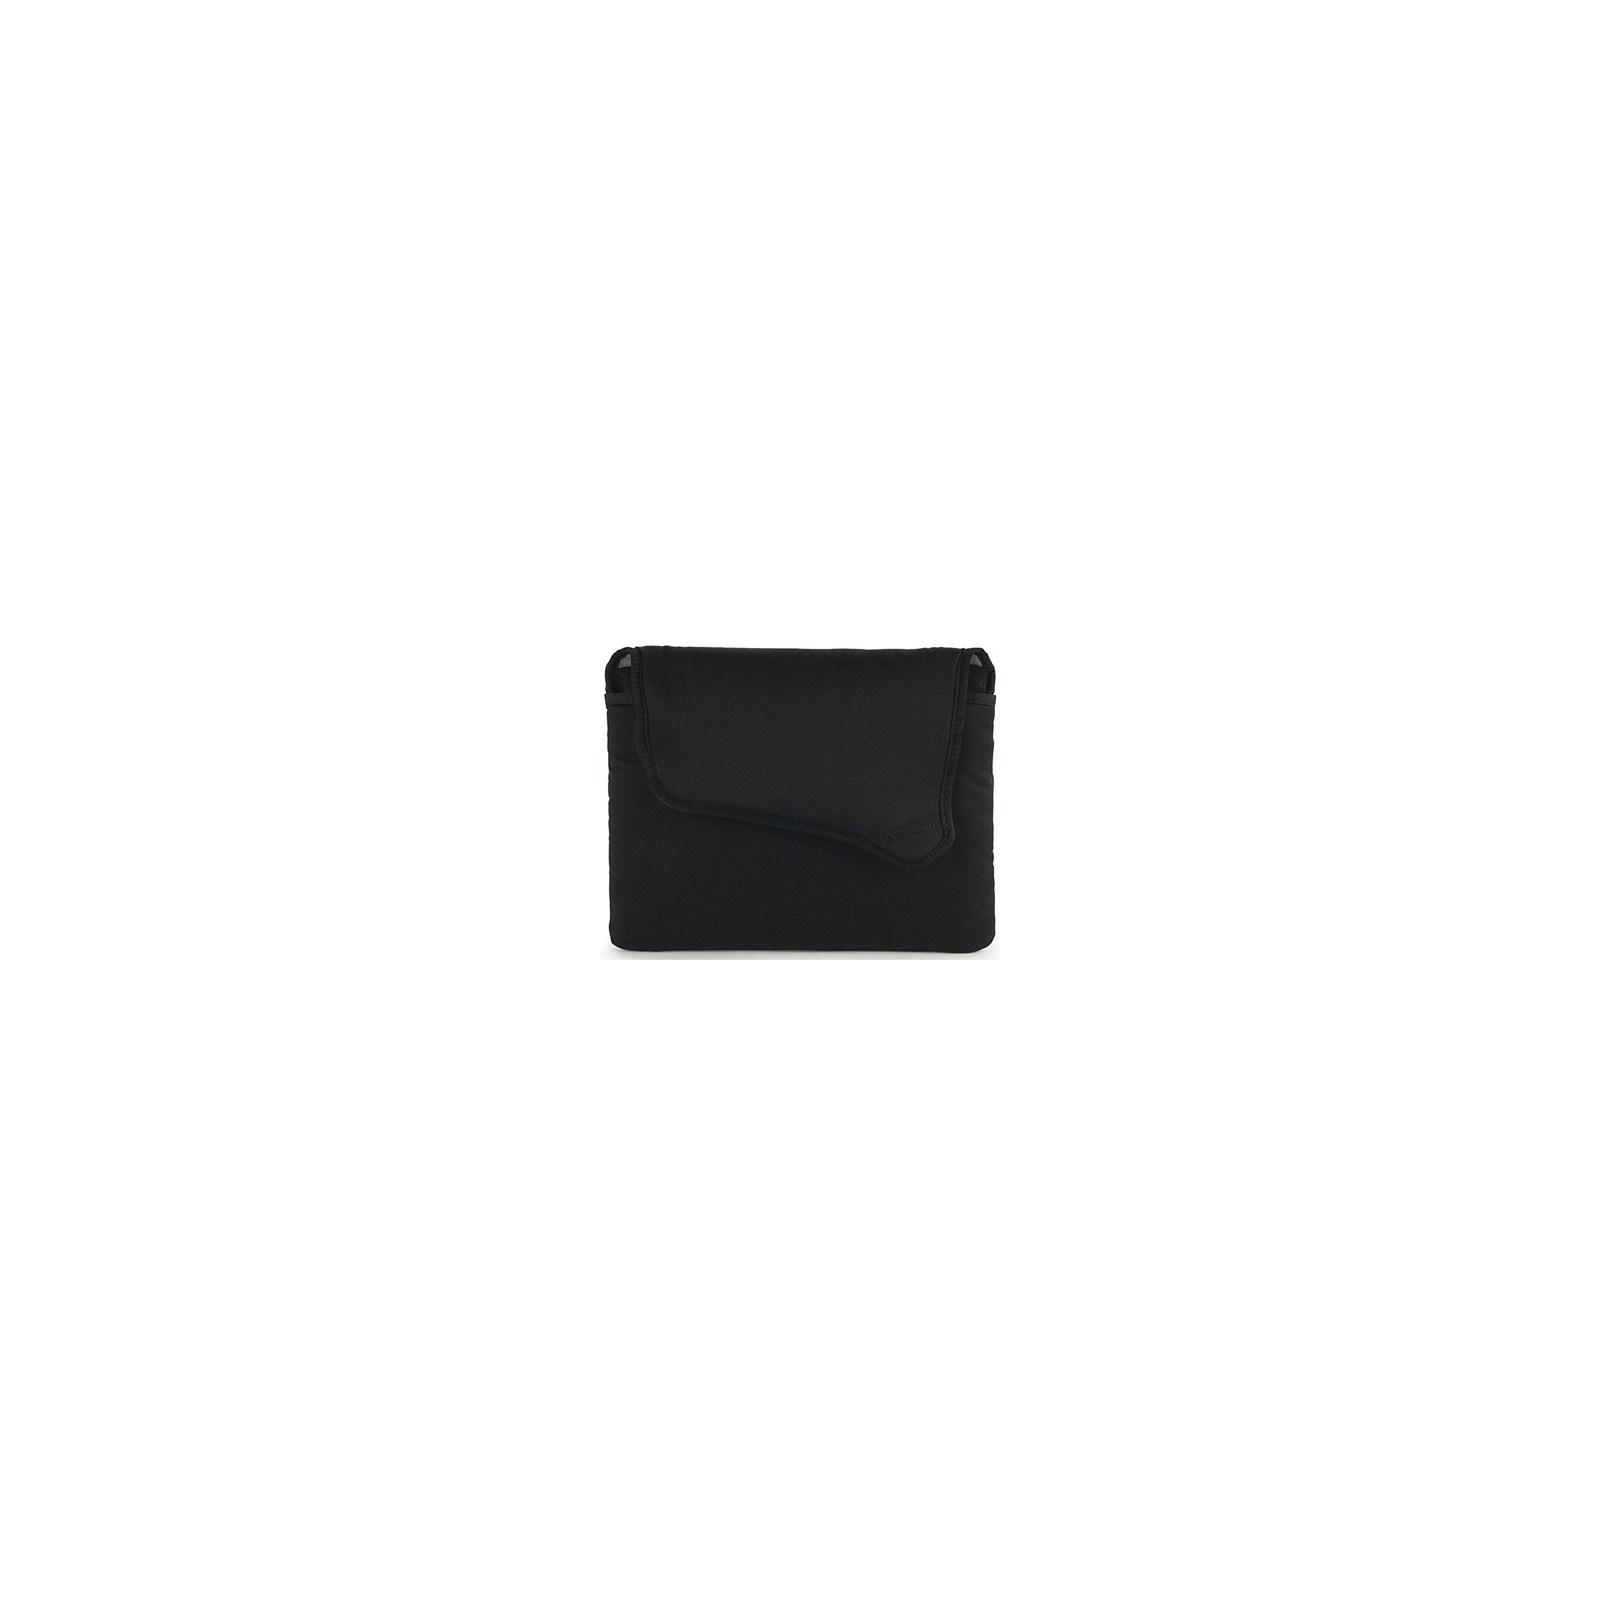 Чехол для планшета Tucano 9.7 Folder softskin (BFSOFTIP)